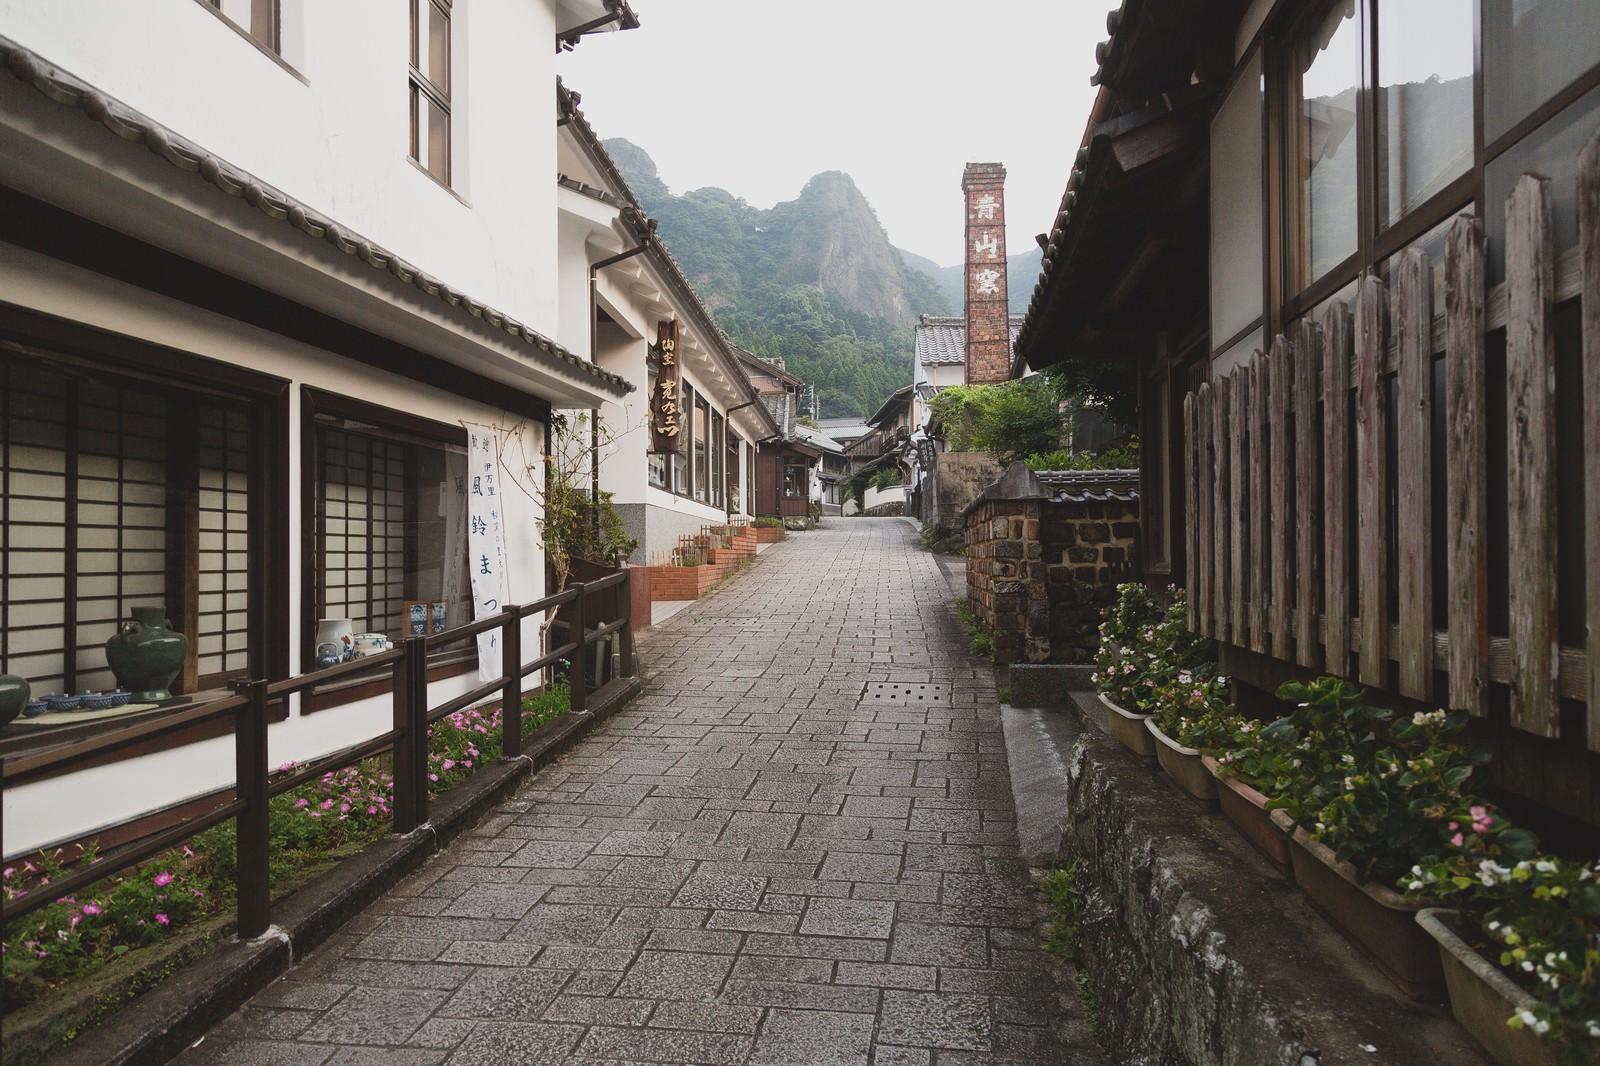 「鍋島探訪「大川内山」鍋島探訪「大川内山」」のフリー写真素材を拡大